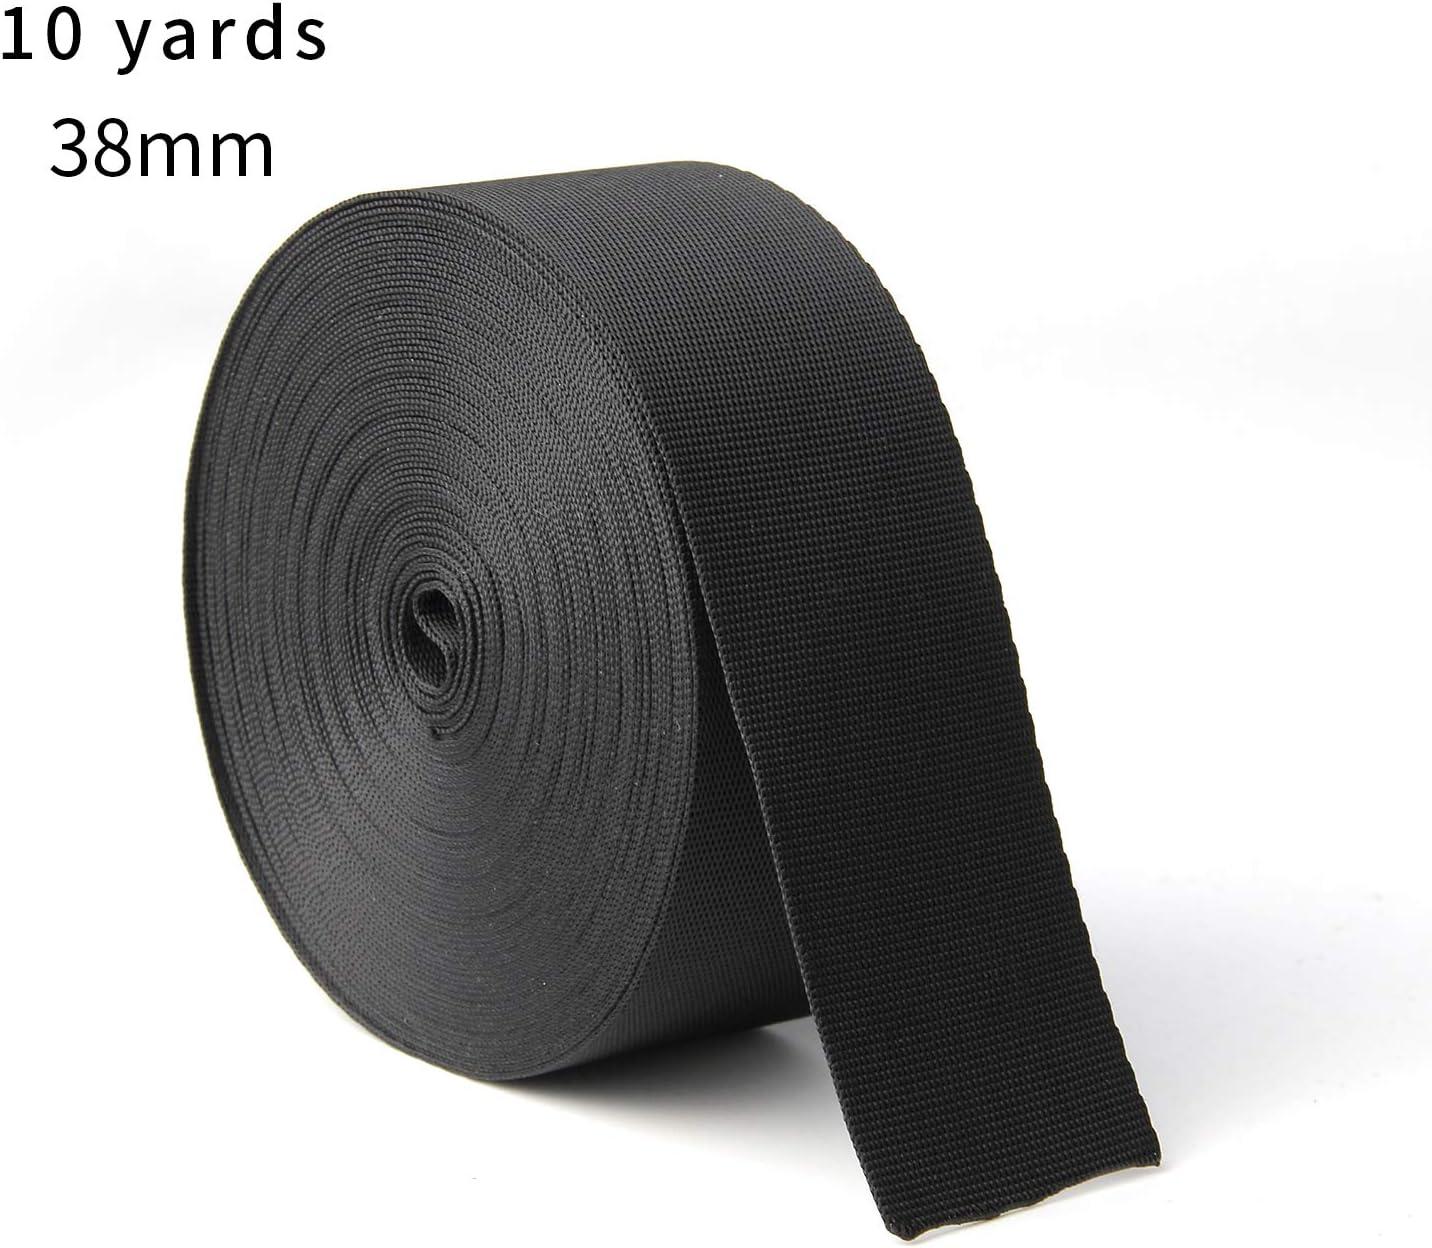 JIAKAI 1.5 Inch Wide 10 Yards Nylon Heavy Duty Webbing Strap,Polypropylene Heavy Straps for Bags, Hammocks, Outdoor Climbing and DIY Making Luggage Strap, Pet Collar, Backpack Repairing(Black)